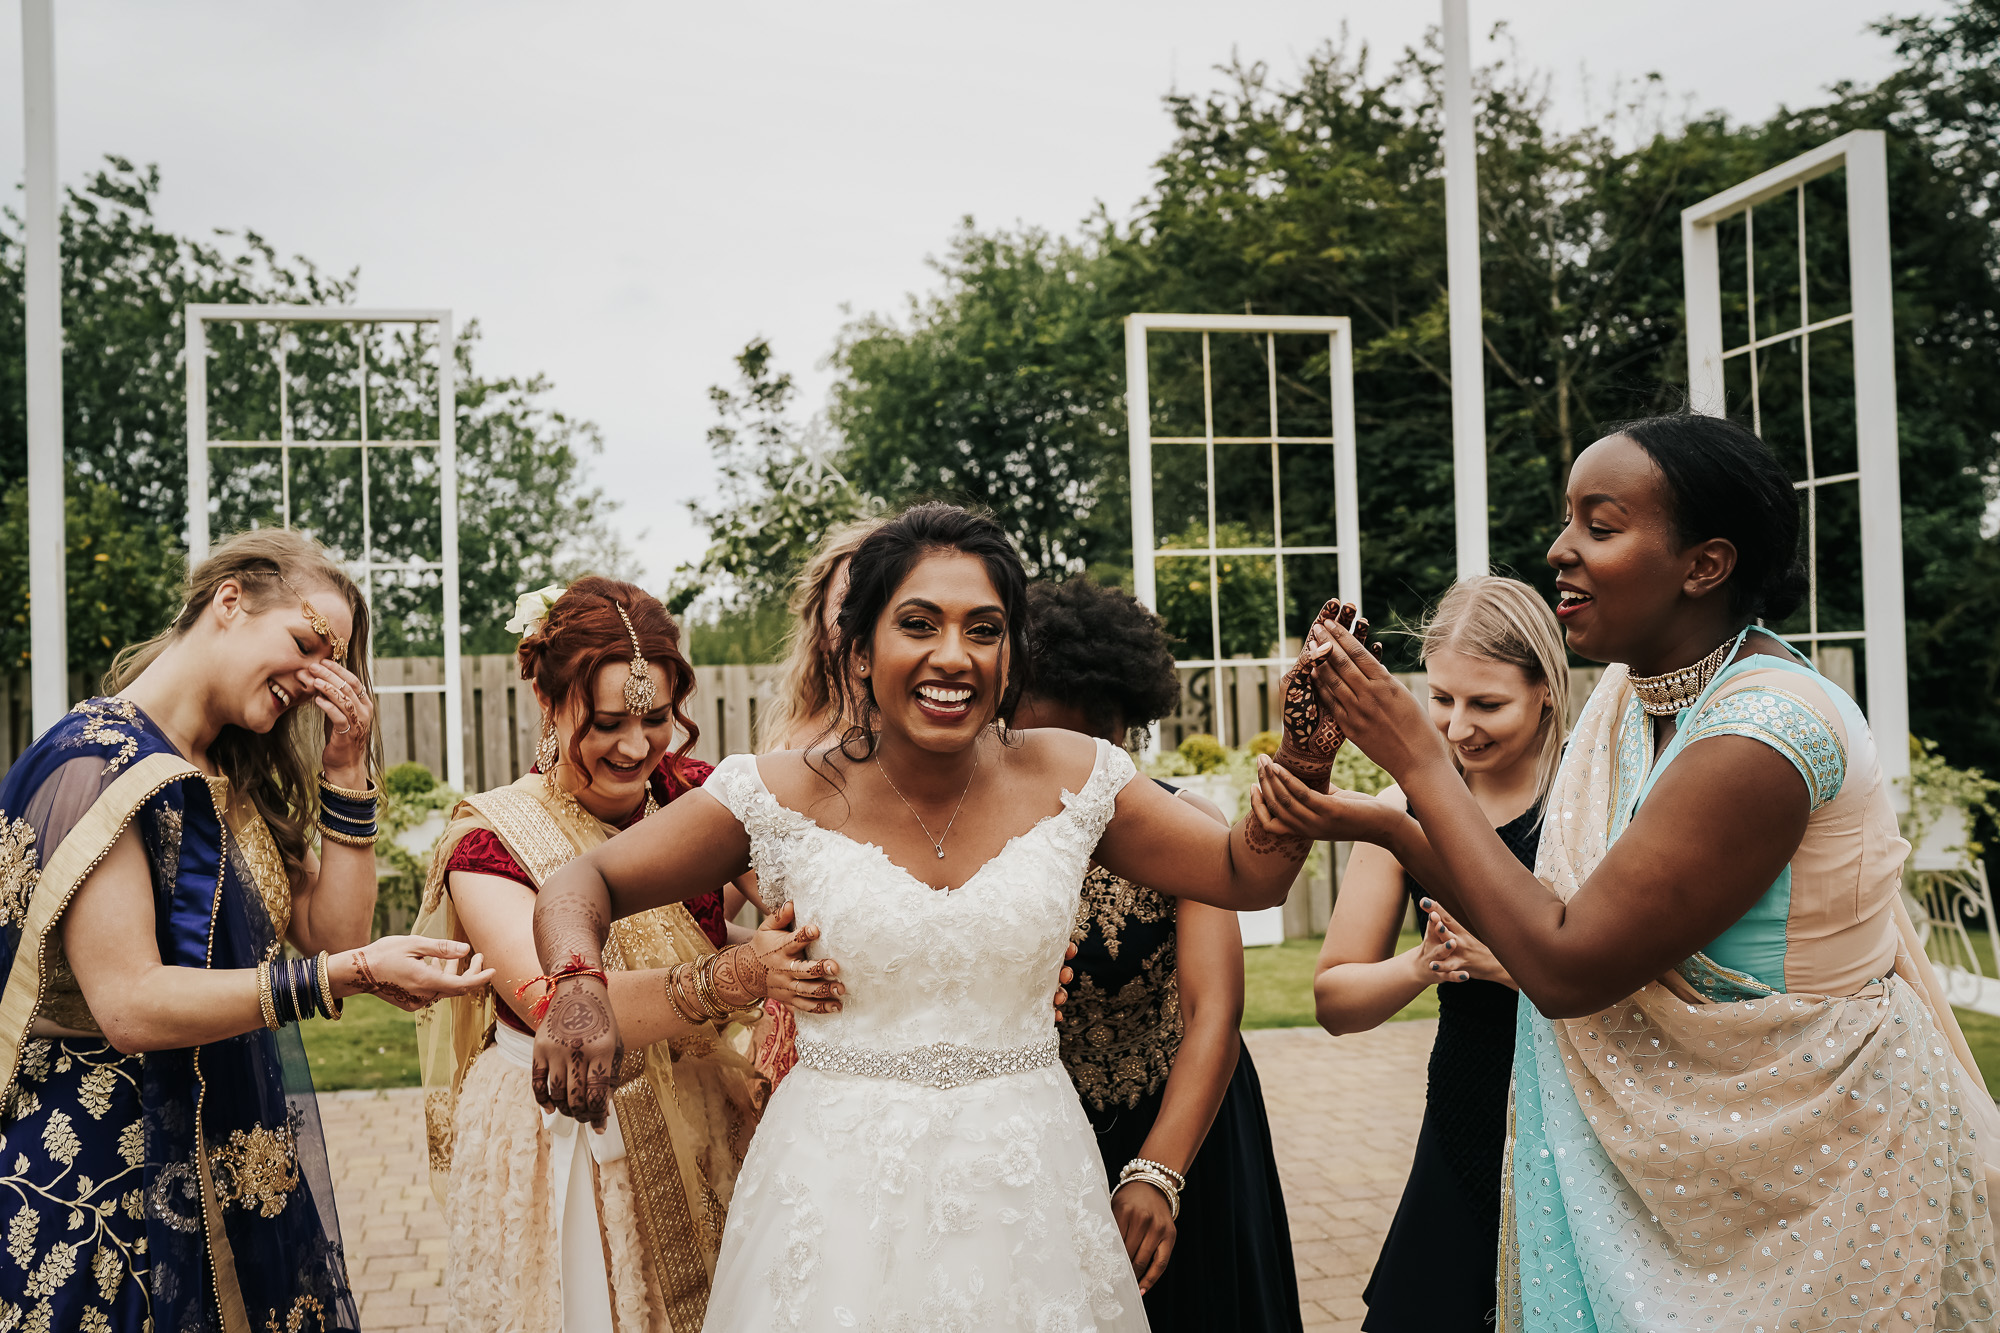 Alcumlow Hall Farm Indian Wedding Photographer (33 of 44).jpg